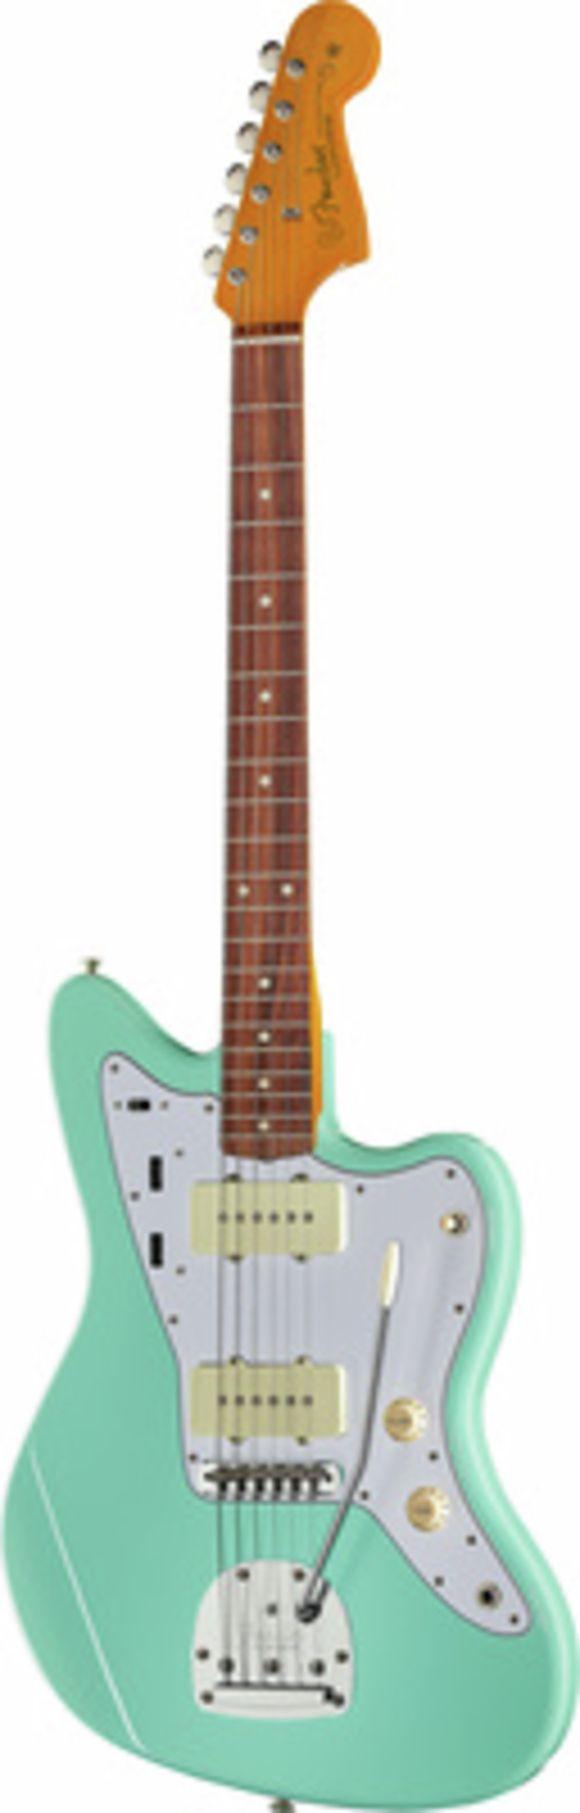 CLSC 60s Jazzmaster LAQ PF SFG Fender